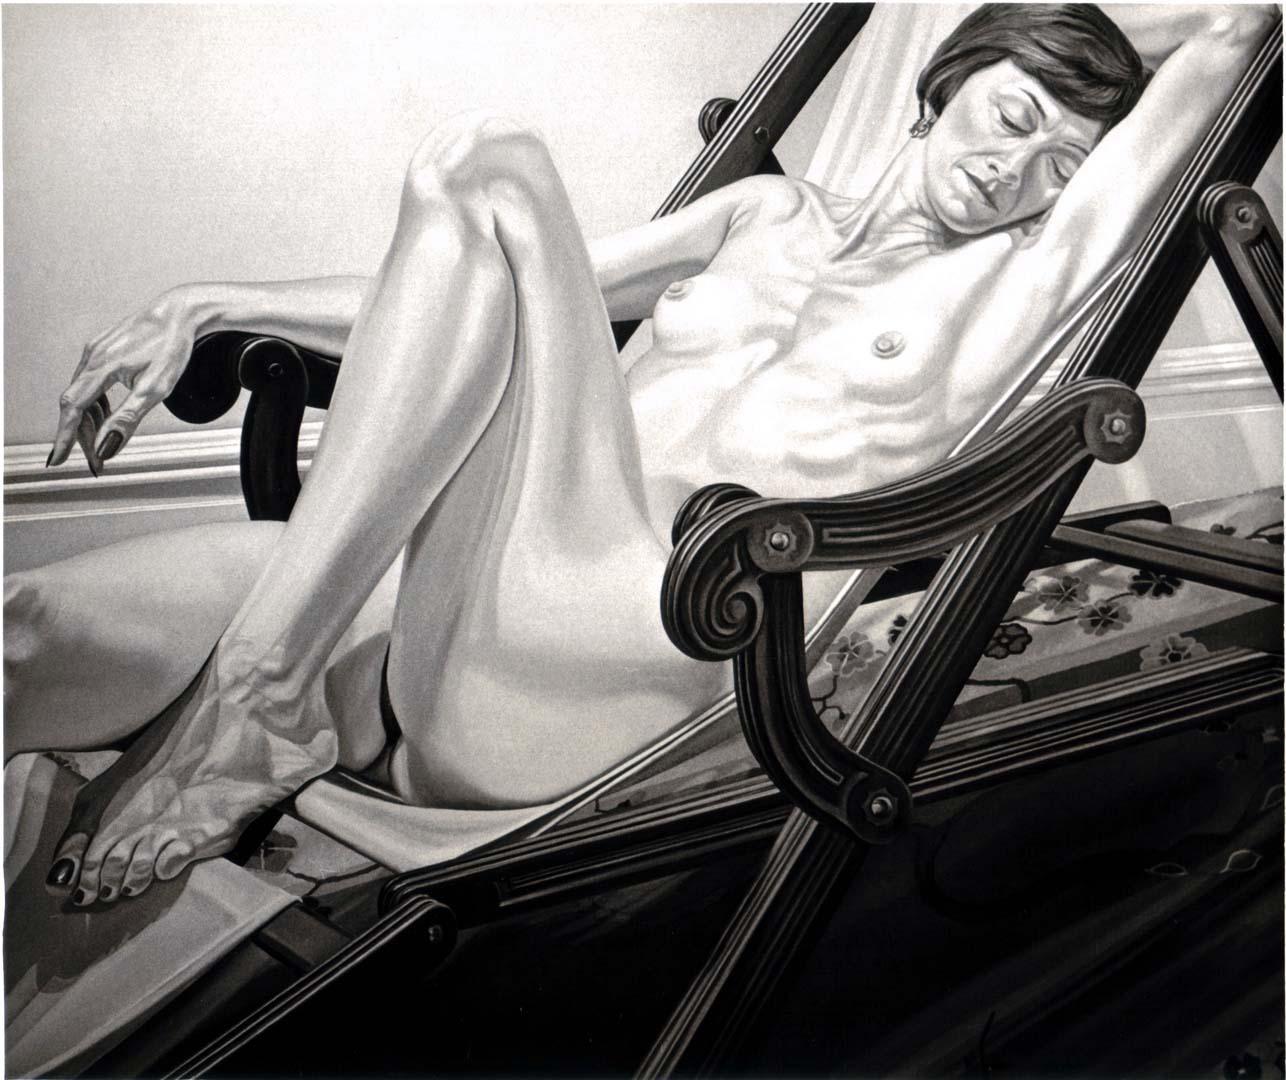 1977 Portrait of Nancy Melzer Oil on canvas 60 x 70